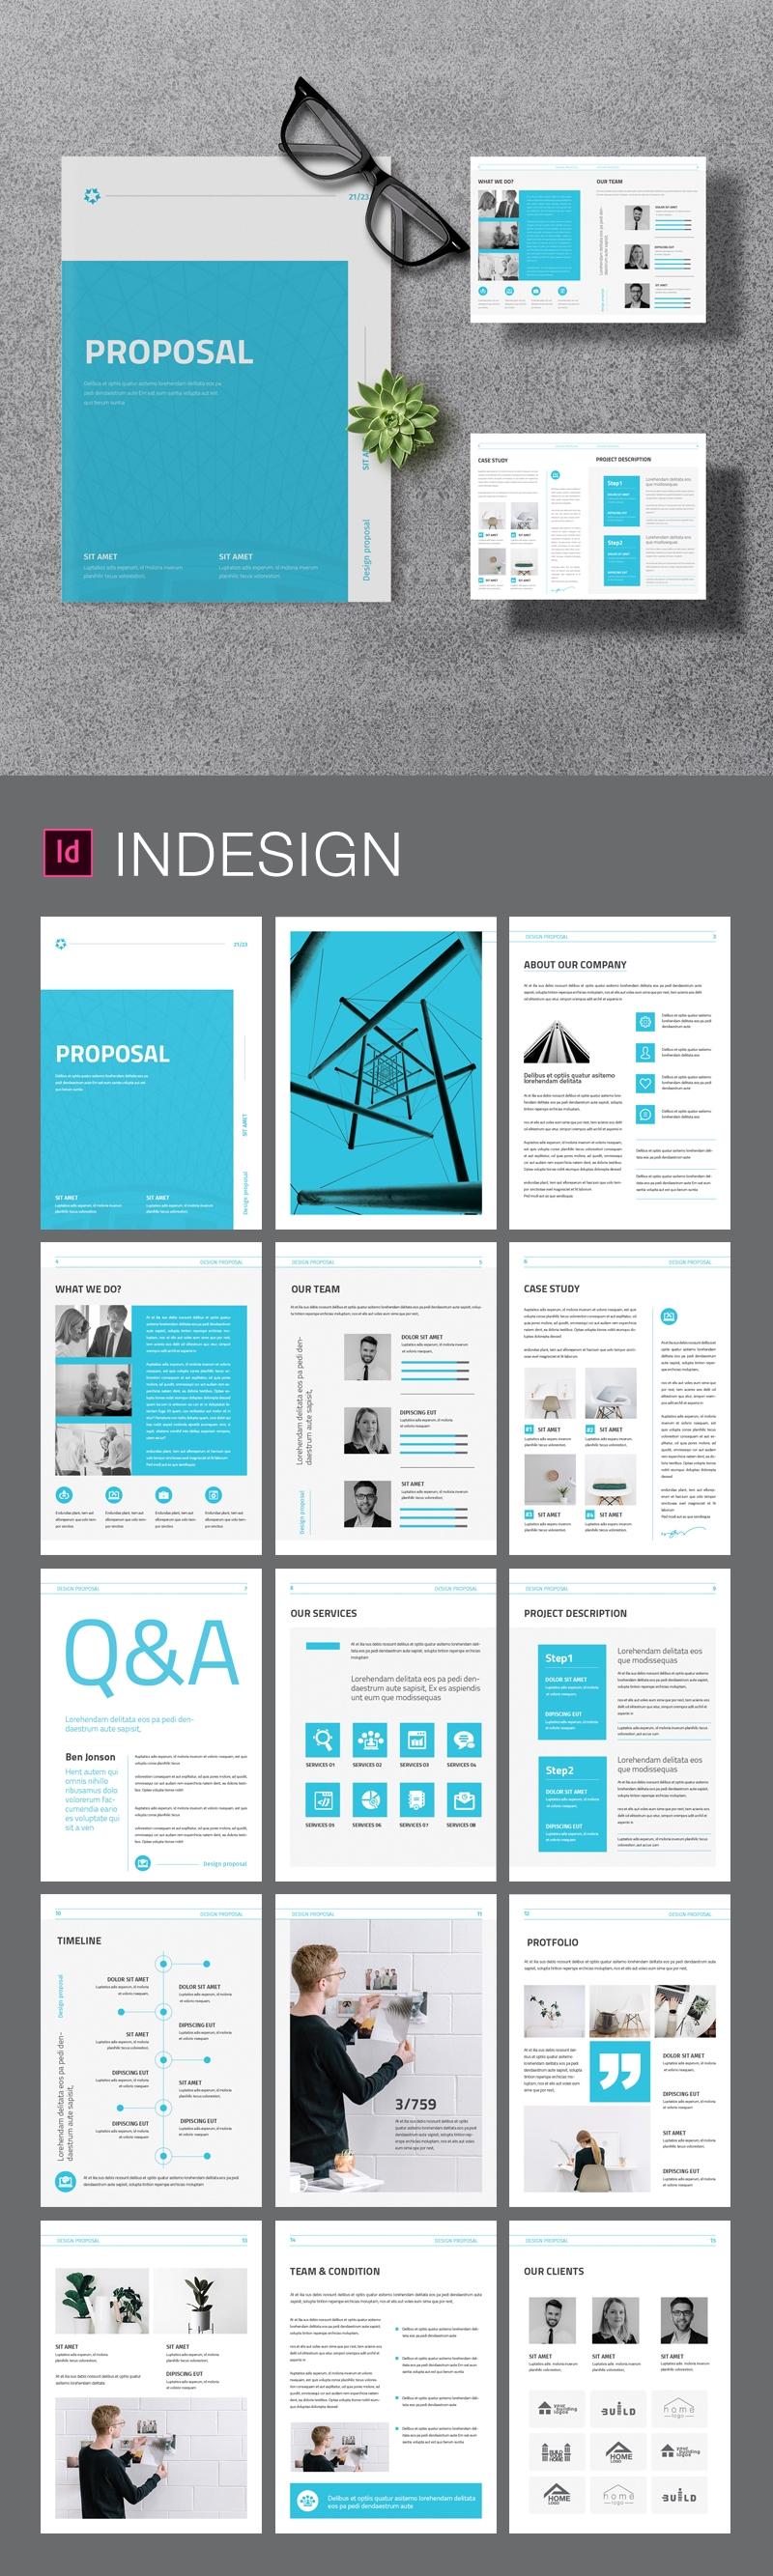 Creative Business Proposal Template